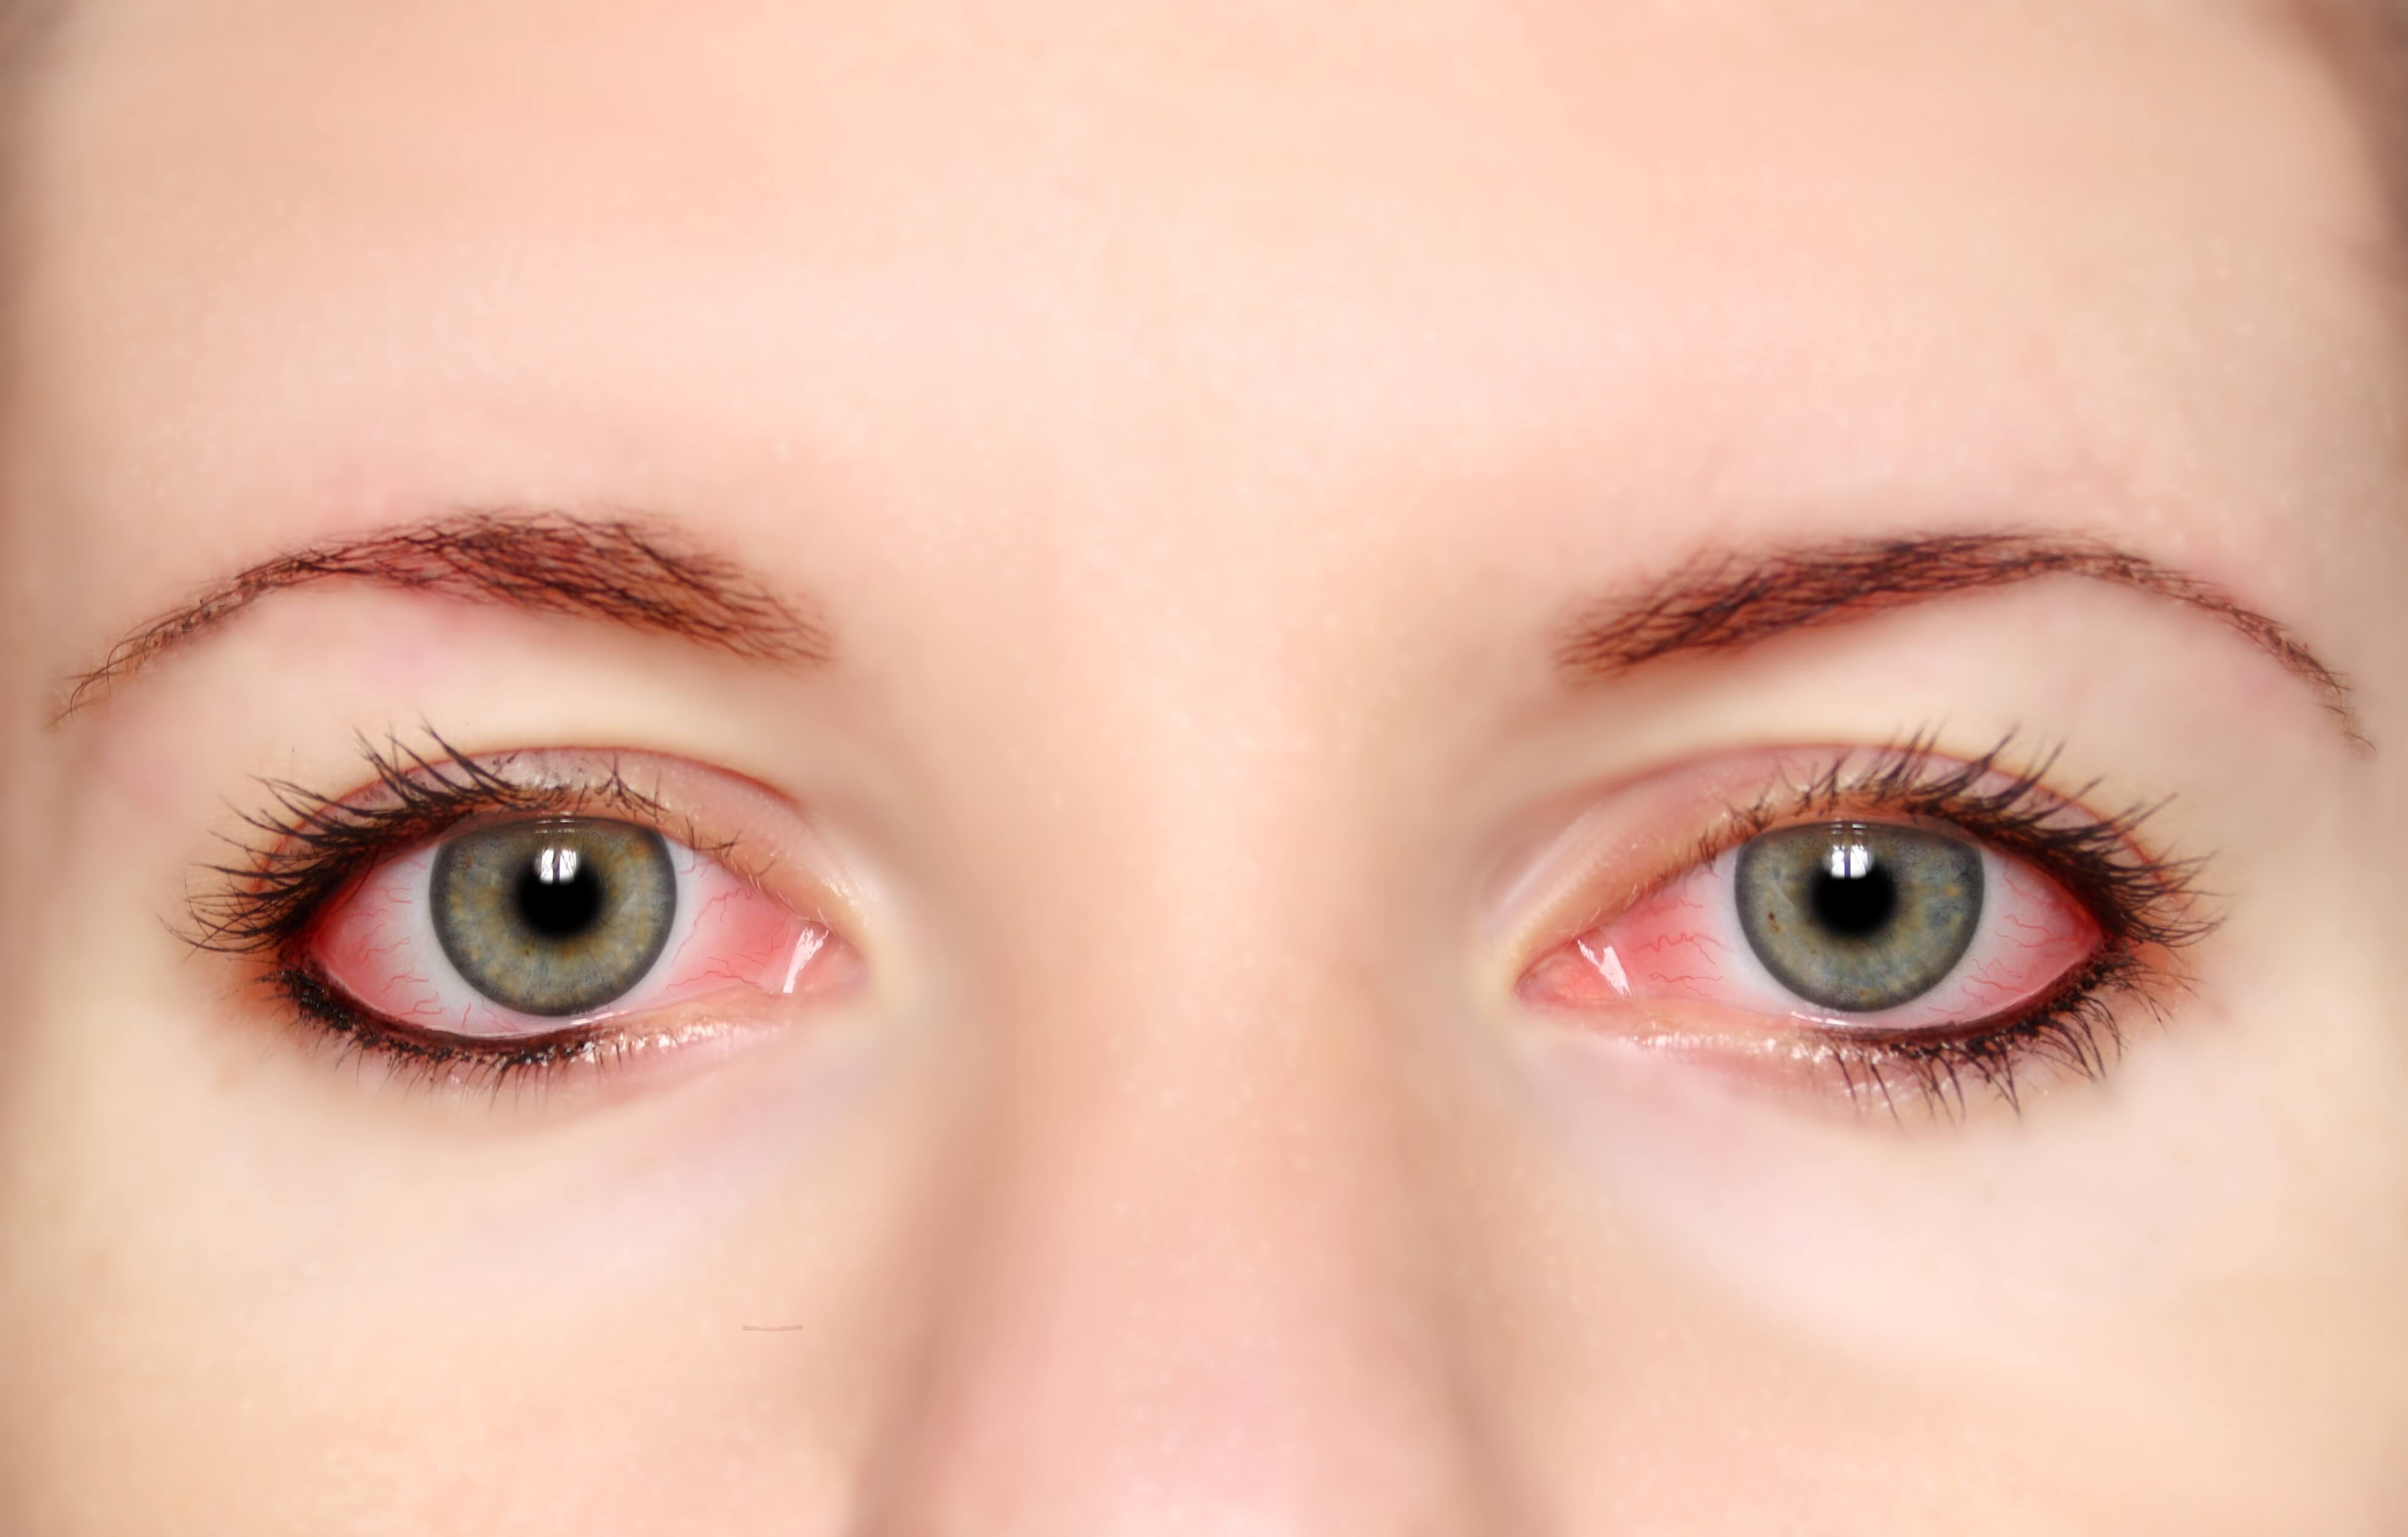 Red watery eyes as a symptom of an eye allergy.